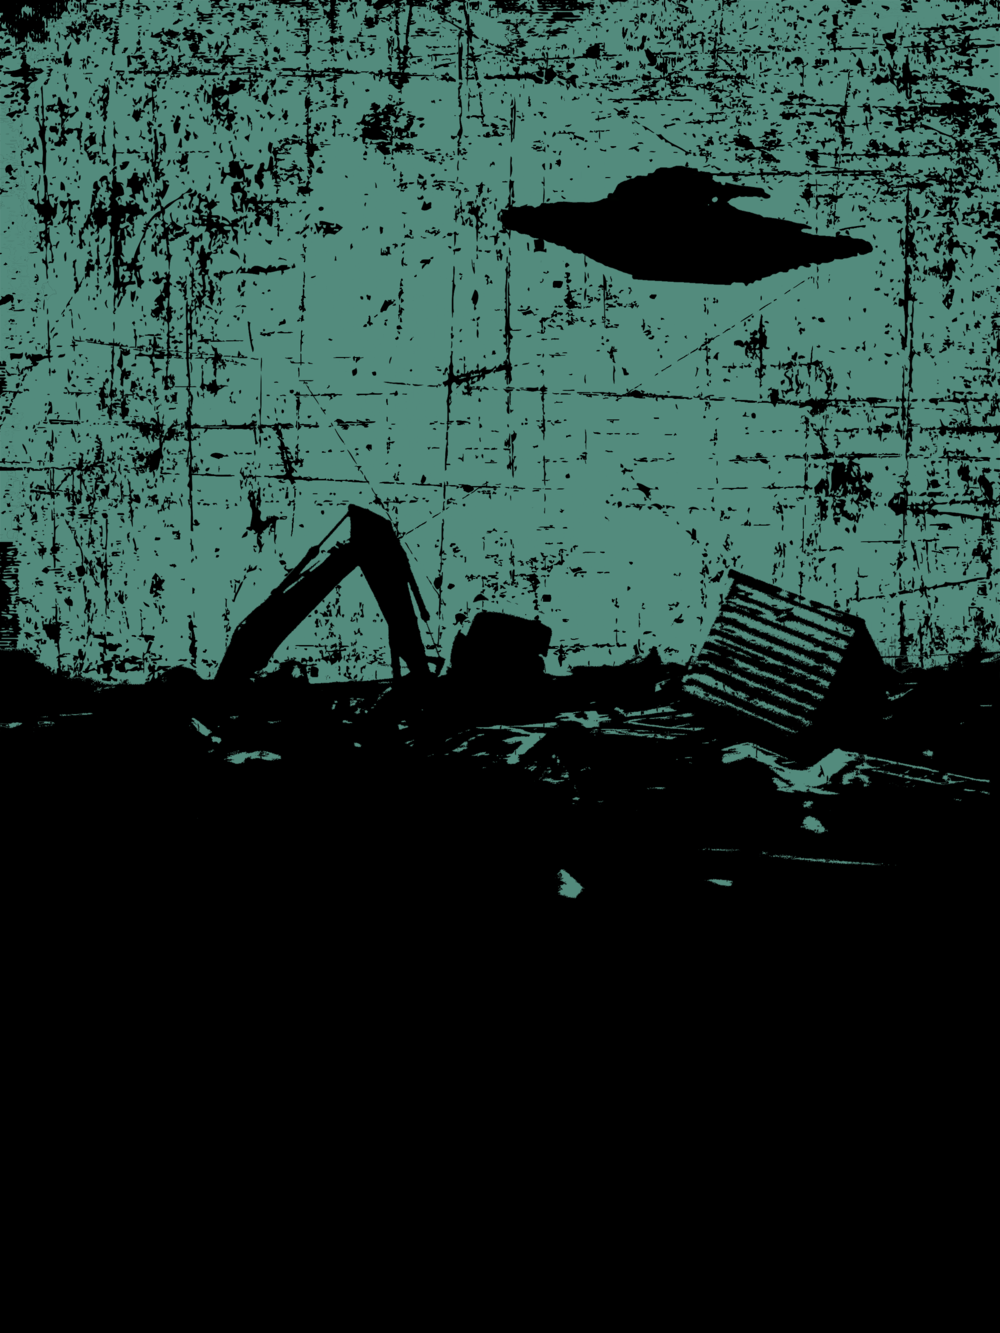 Trash Pile w ufo 14x18.6.png